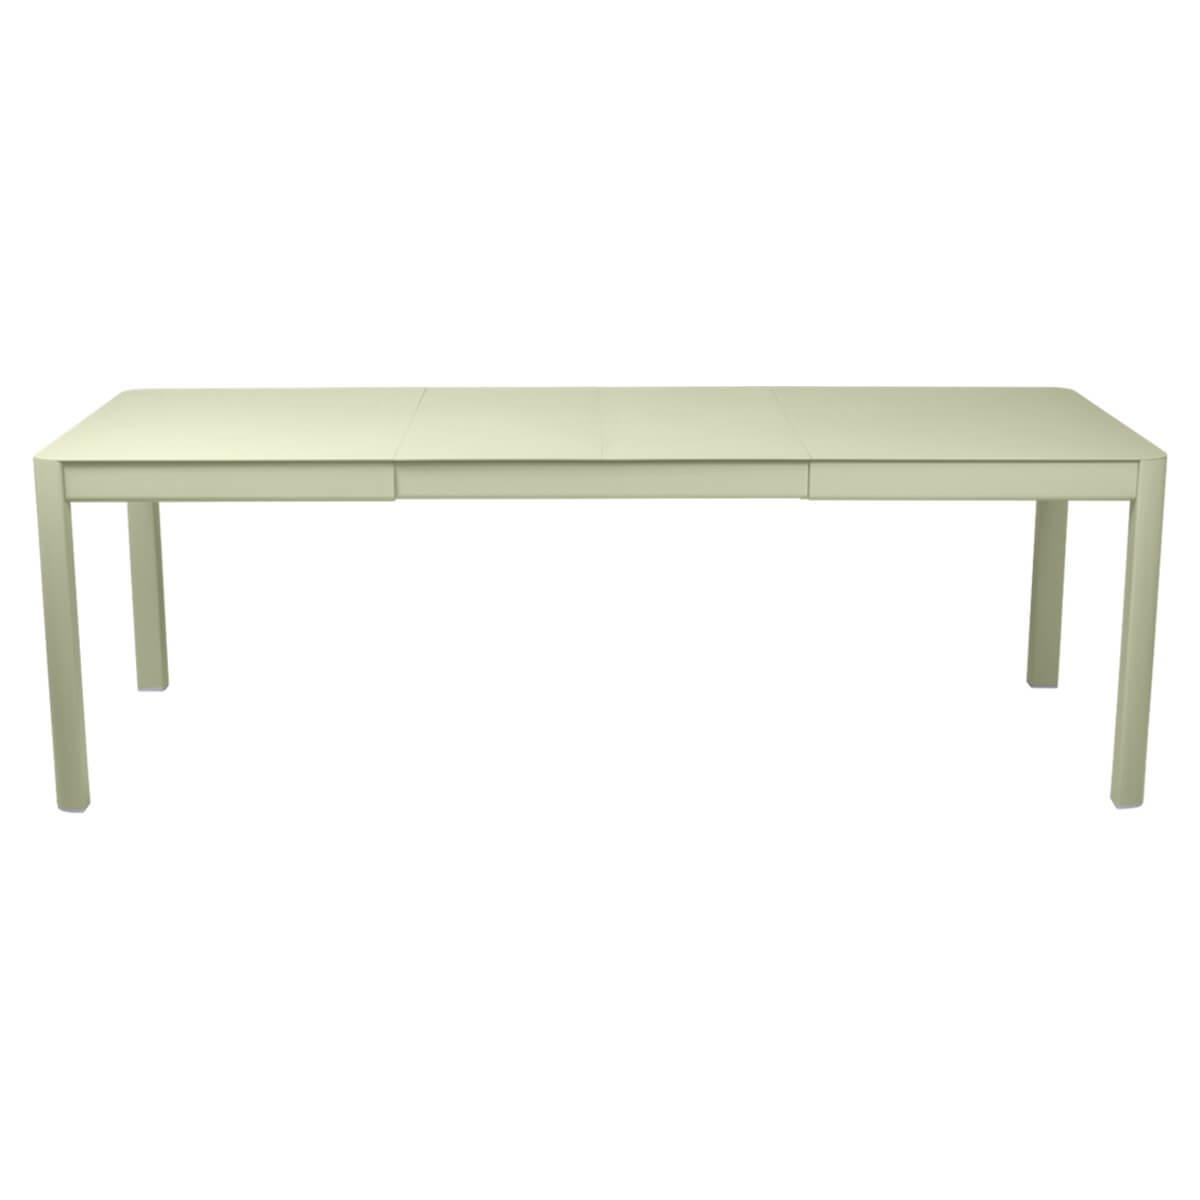 Table à rallonge 149/234x100cm RIBAMBELLE Fermob Vert Tilleul